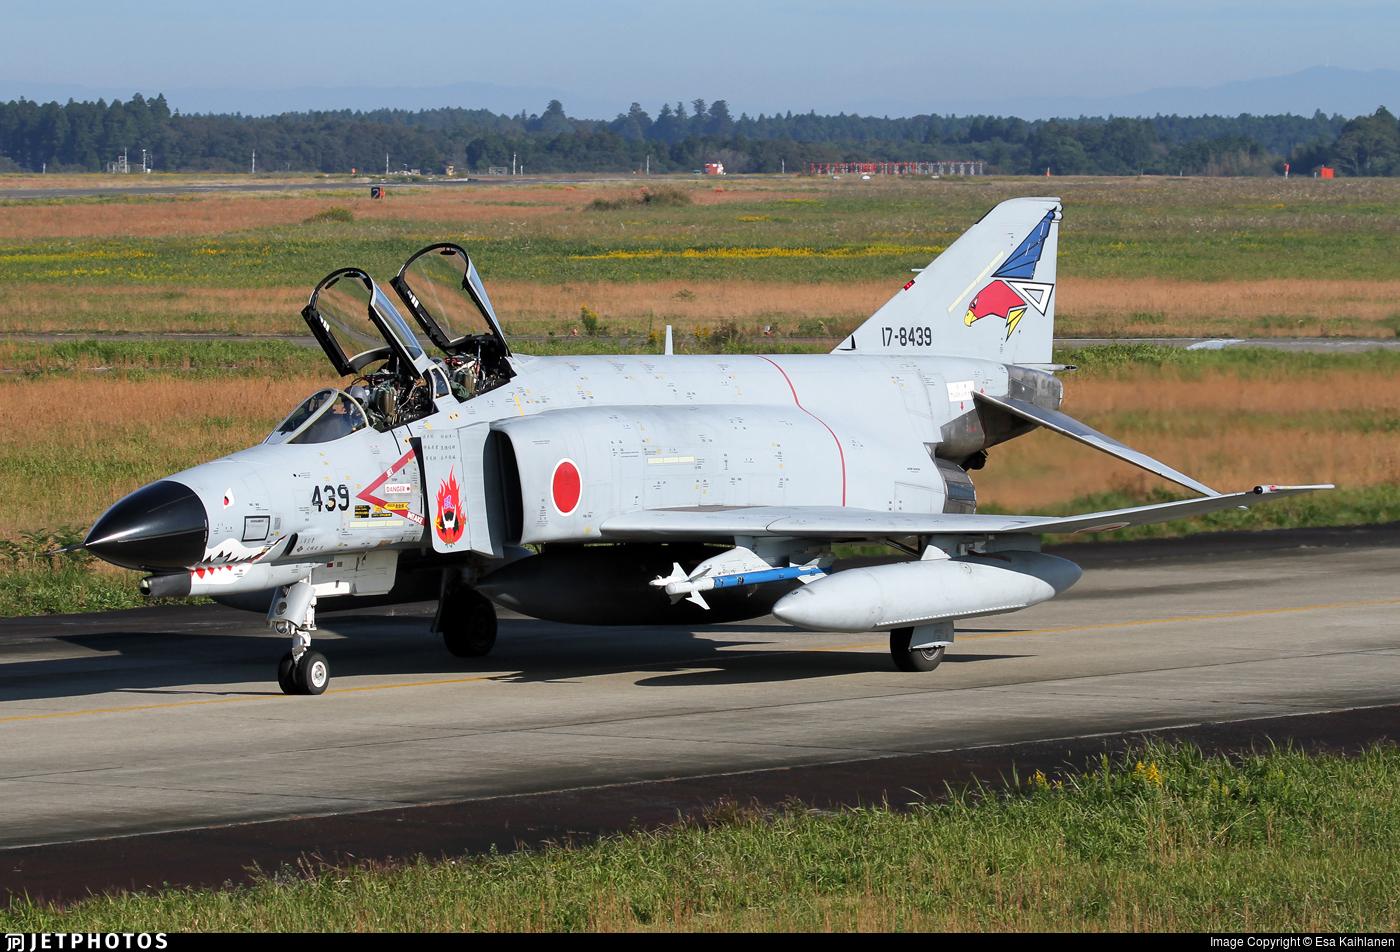 17-8439 - McDonnell Douglas F-4EJ Kai - Japan - Air Self Defence Force (JASDF)